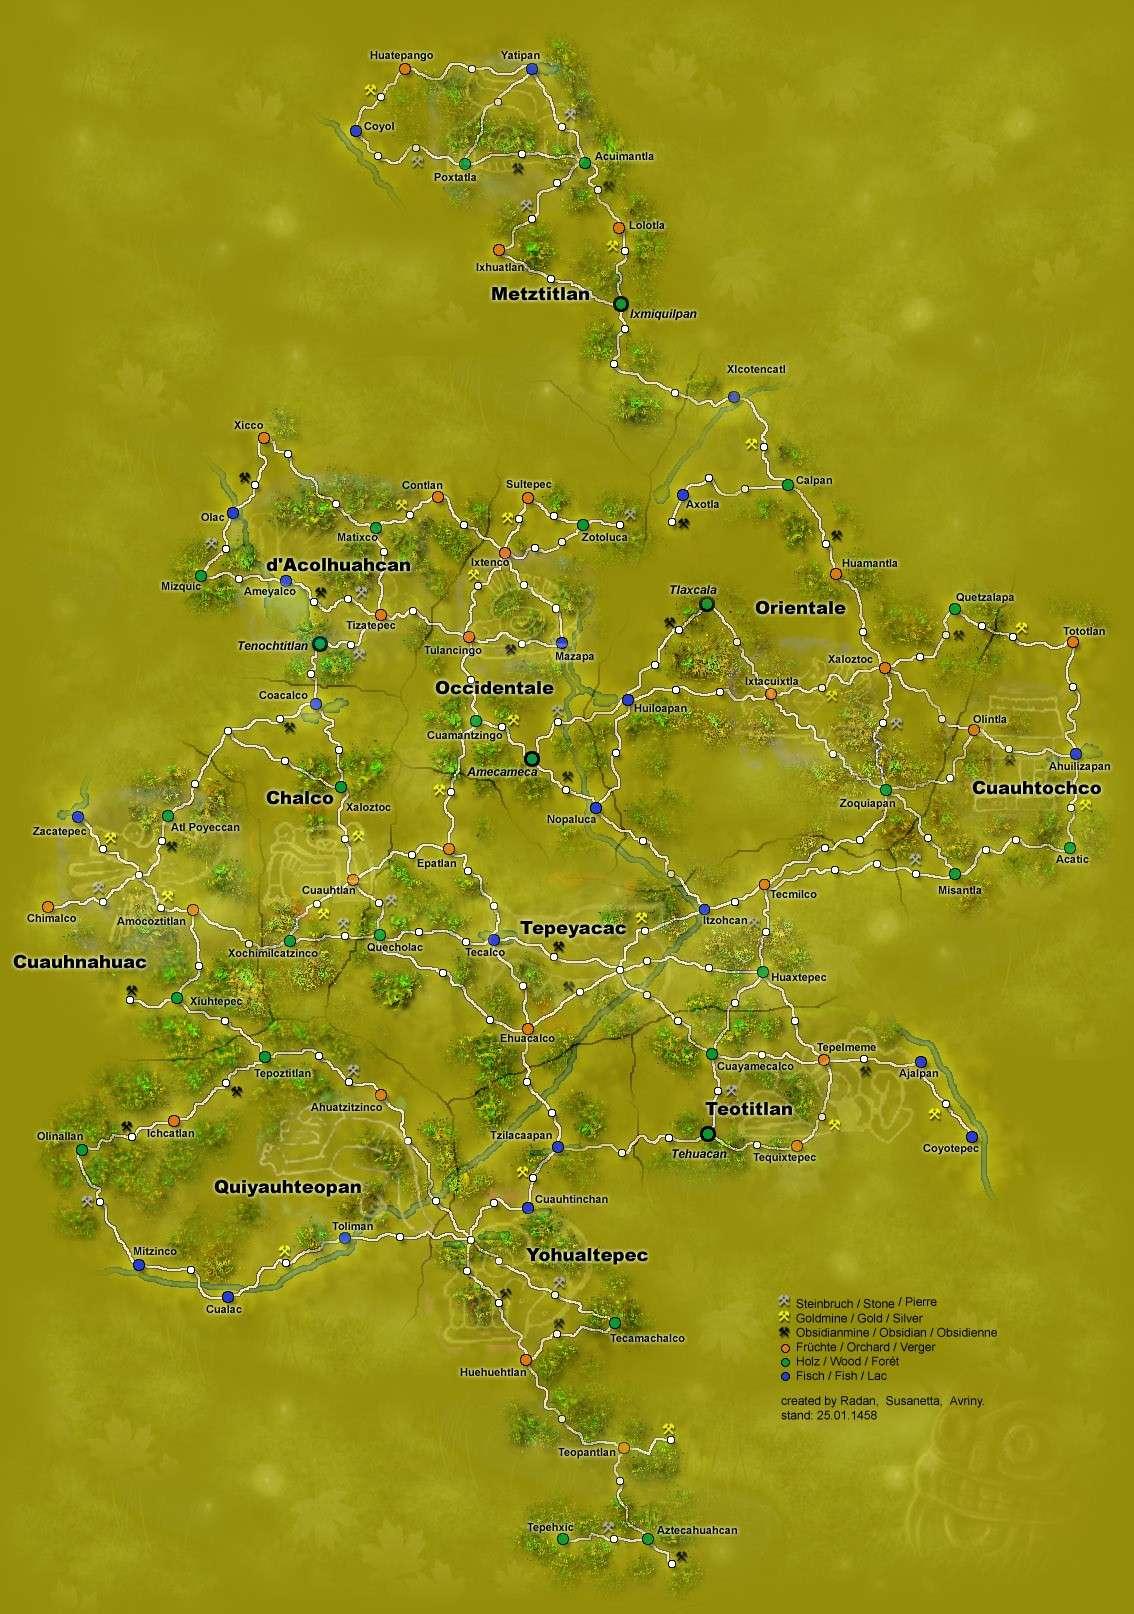 Carte Topographique du Monde Connu Karten11